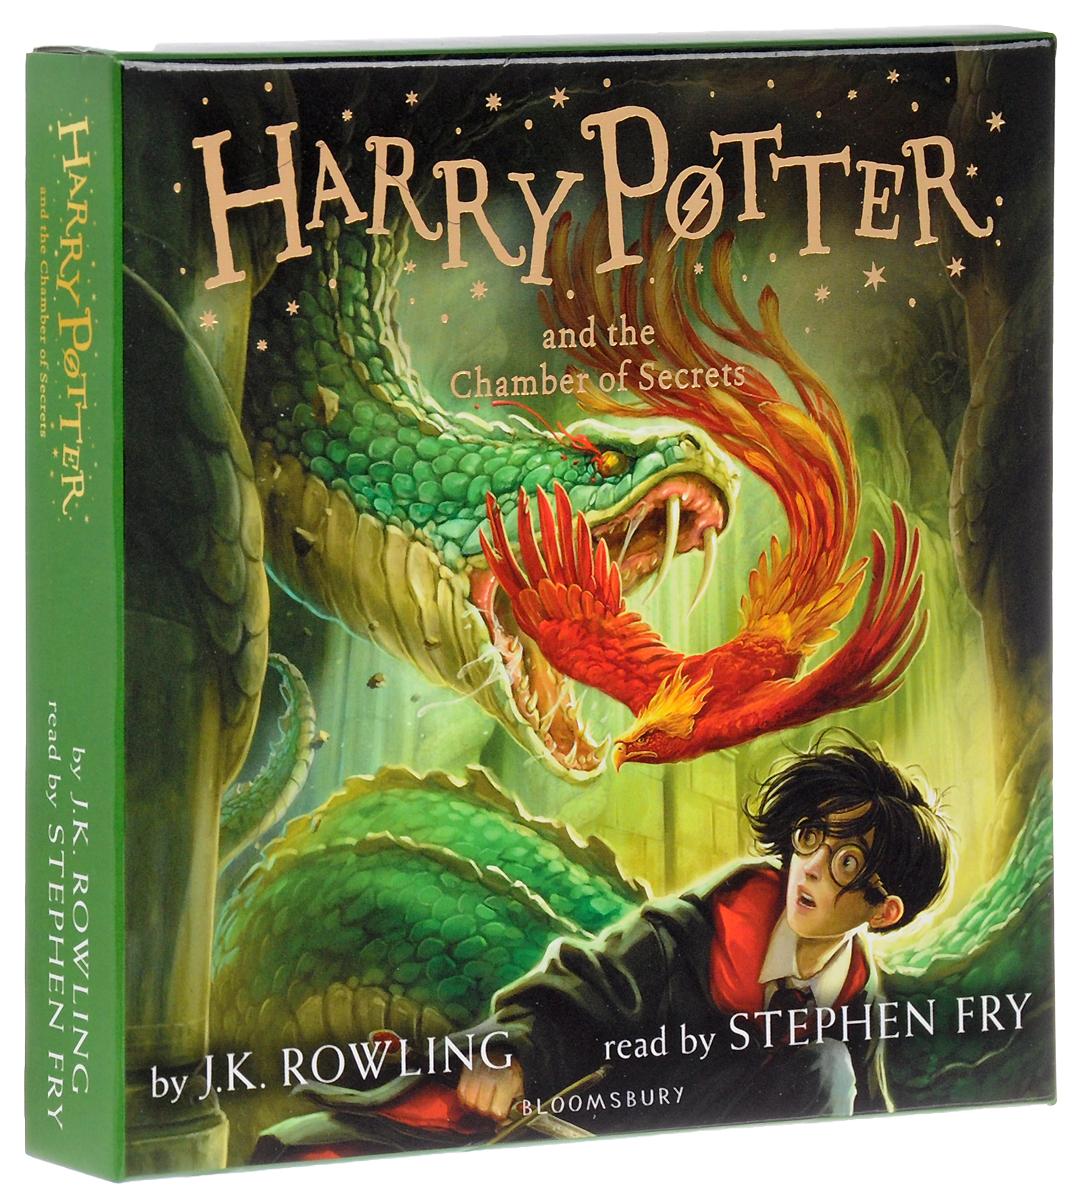 Harry Potter and the Chamber of Secrets (аудиокнига на 8 CD)